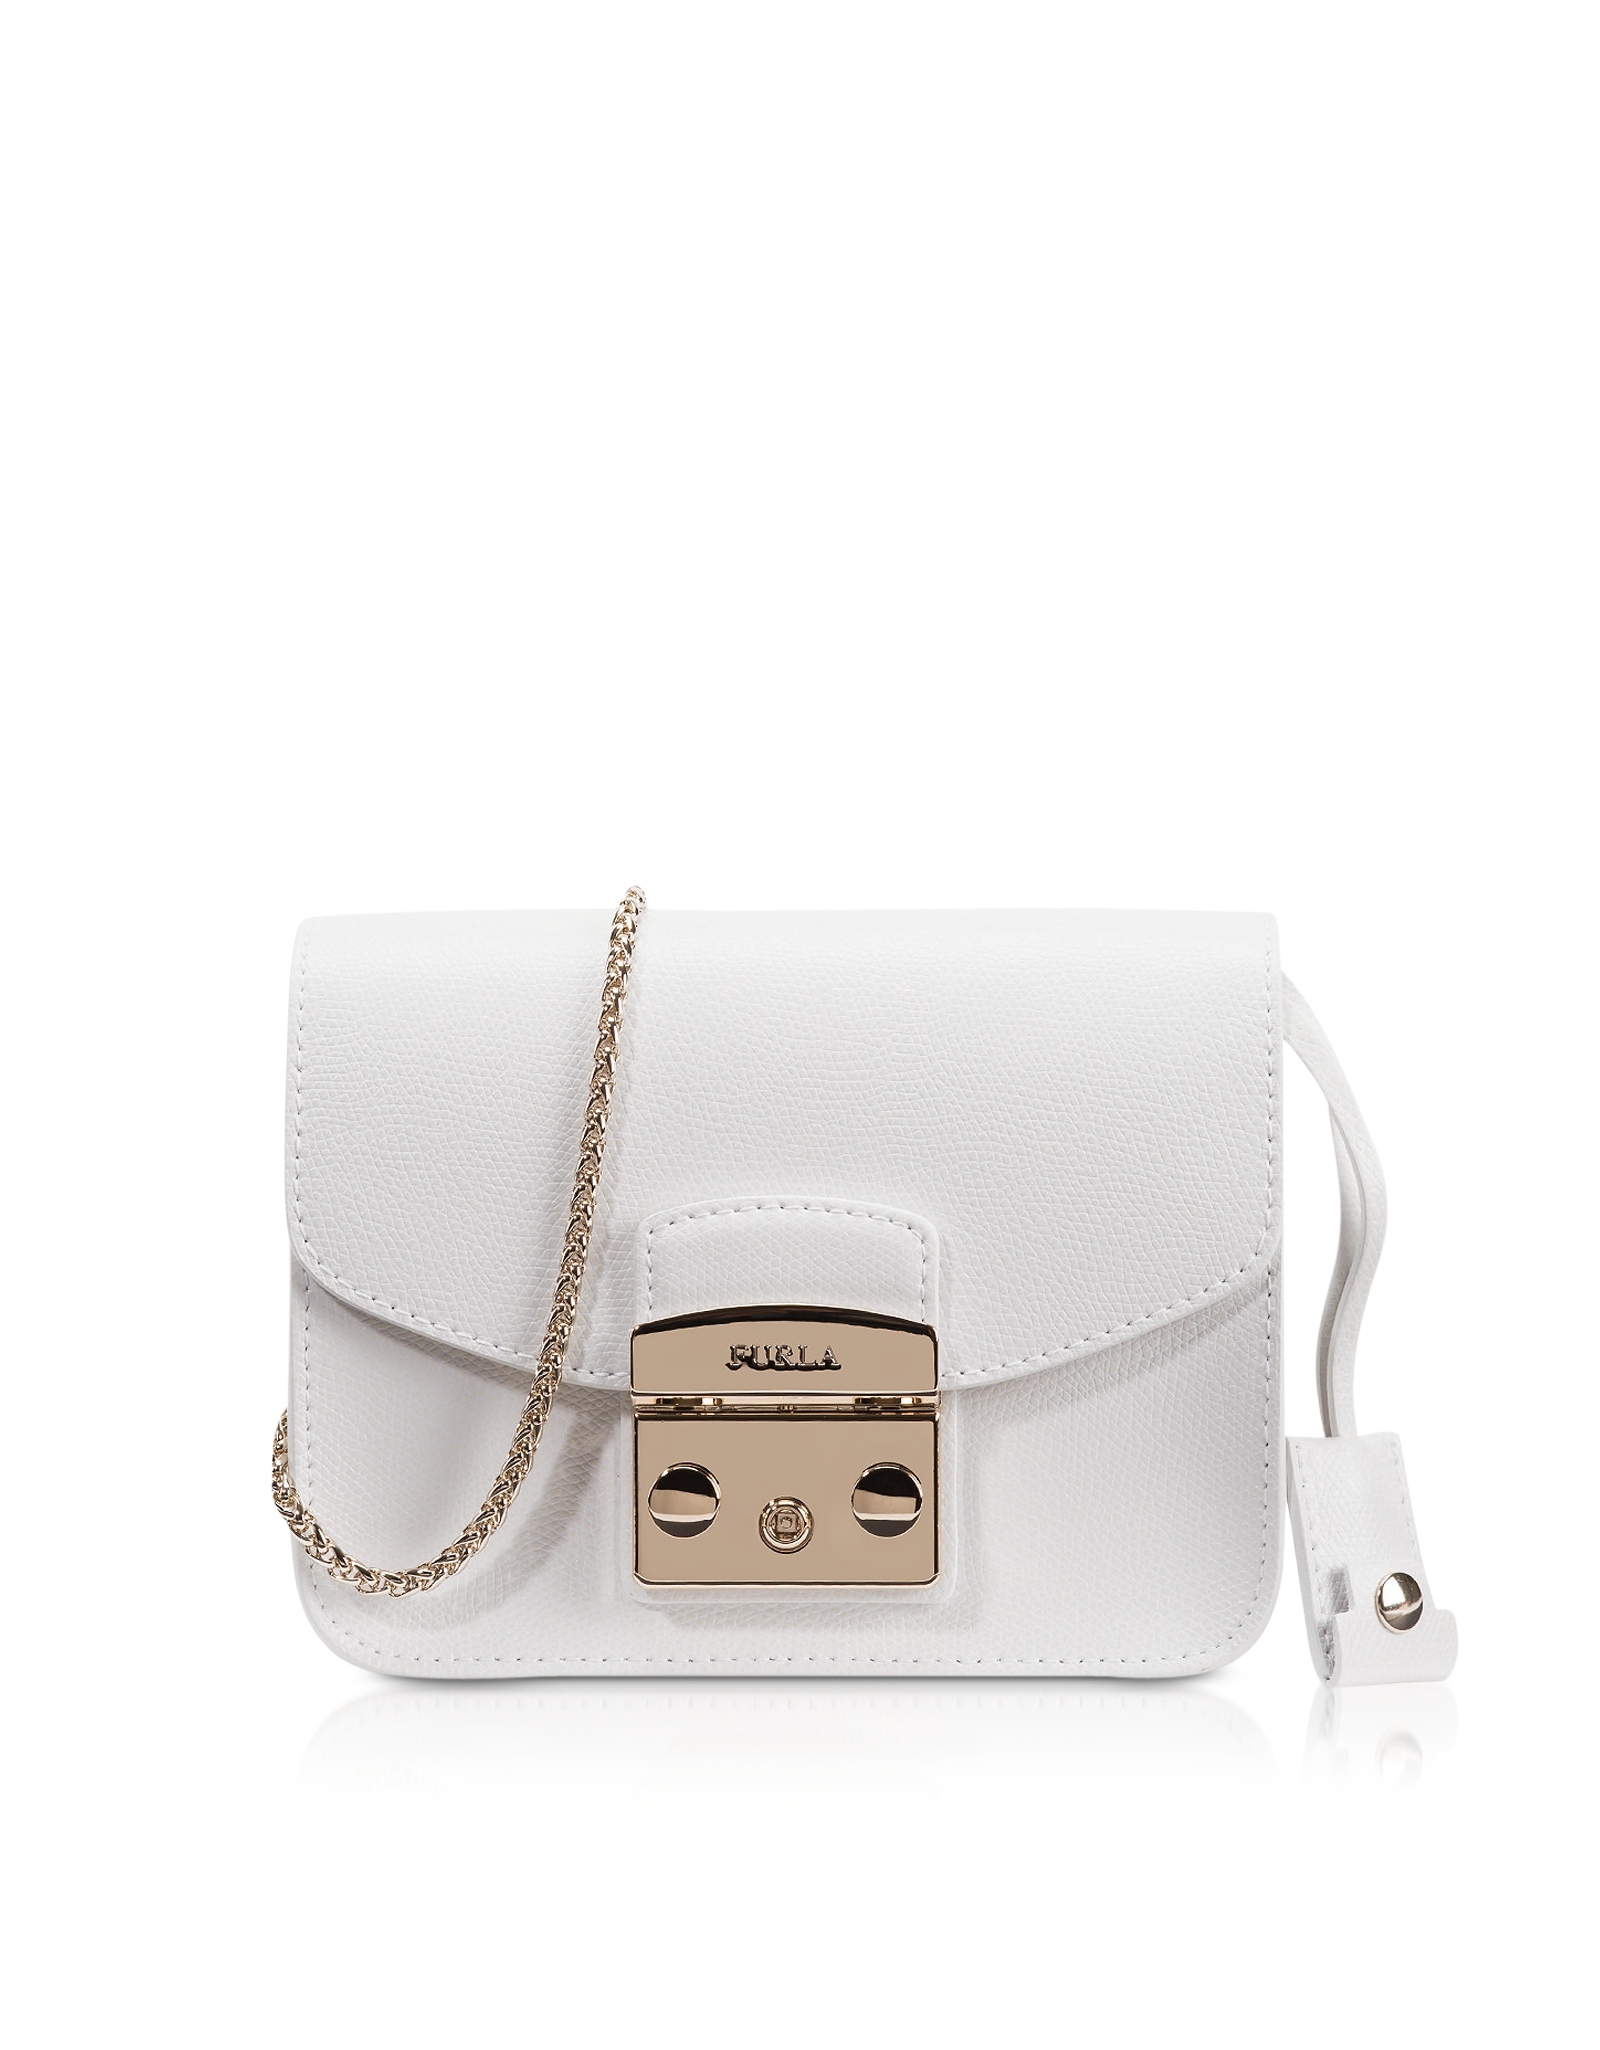 Furla Metropolis Chalk Leather Mini Crossbody Bag In White